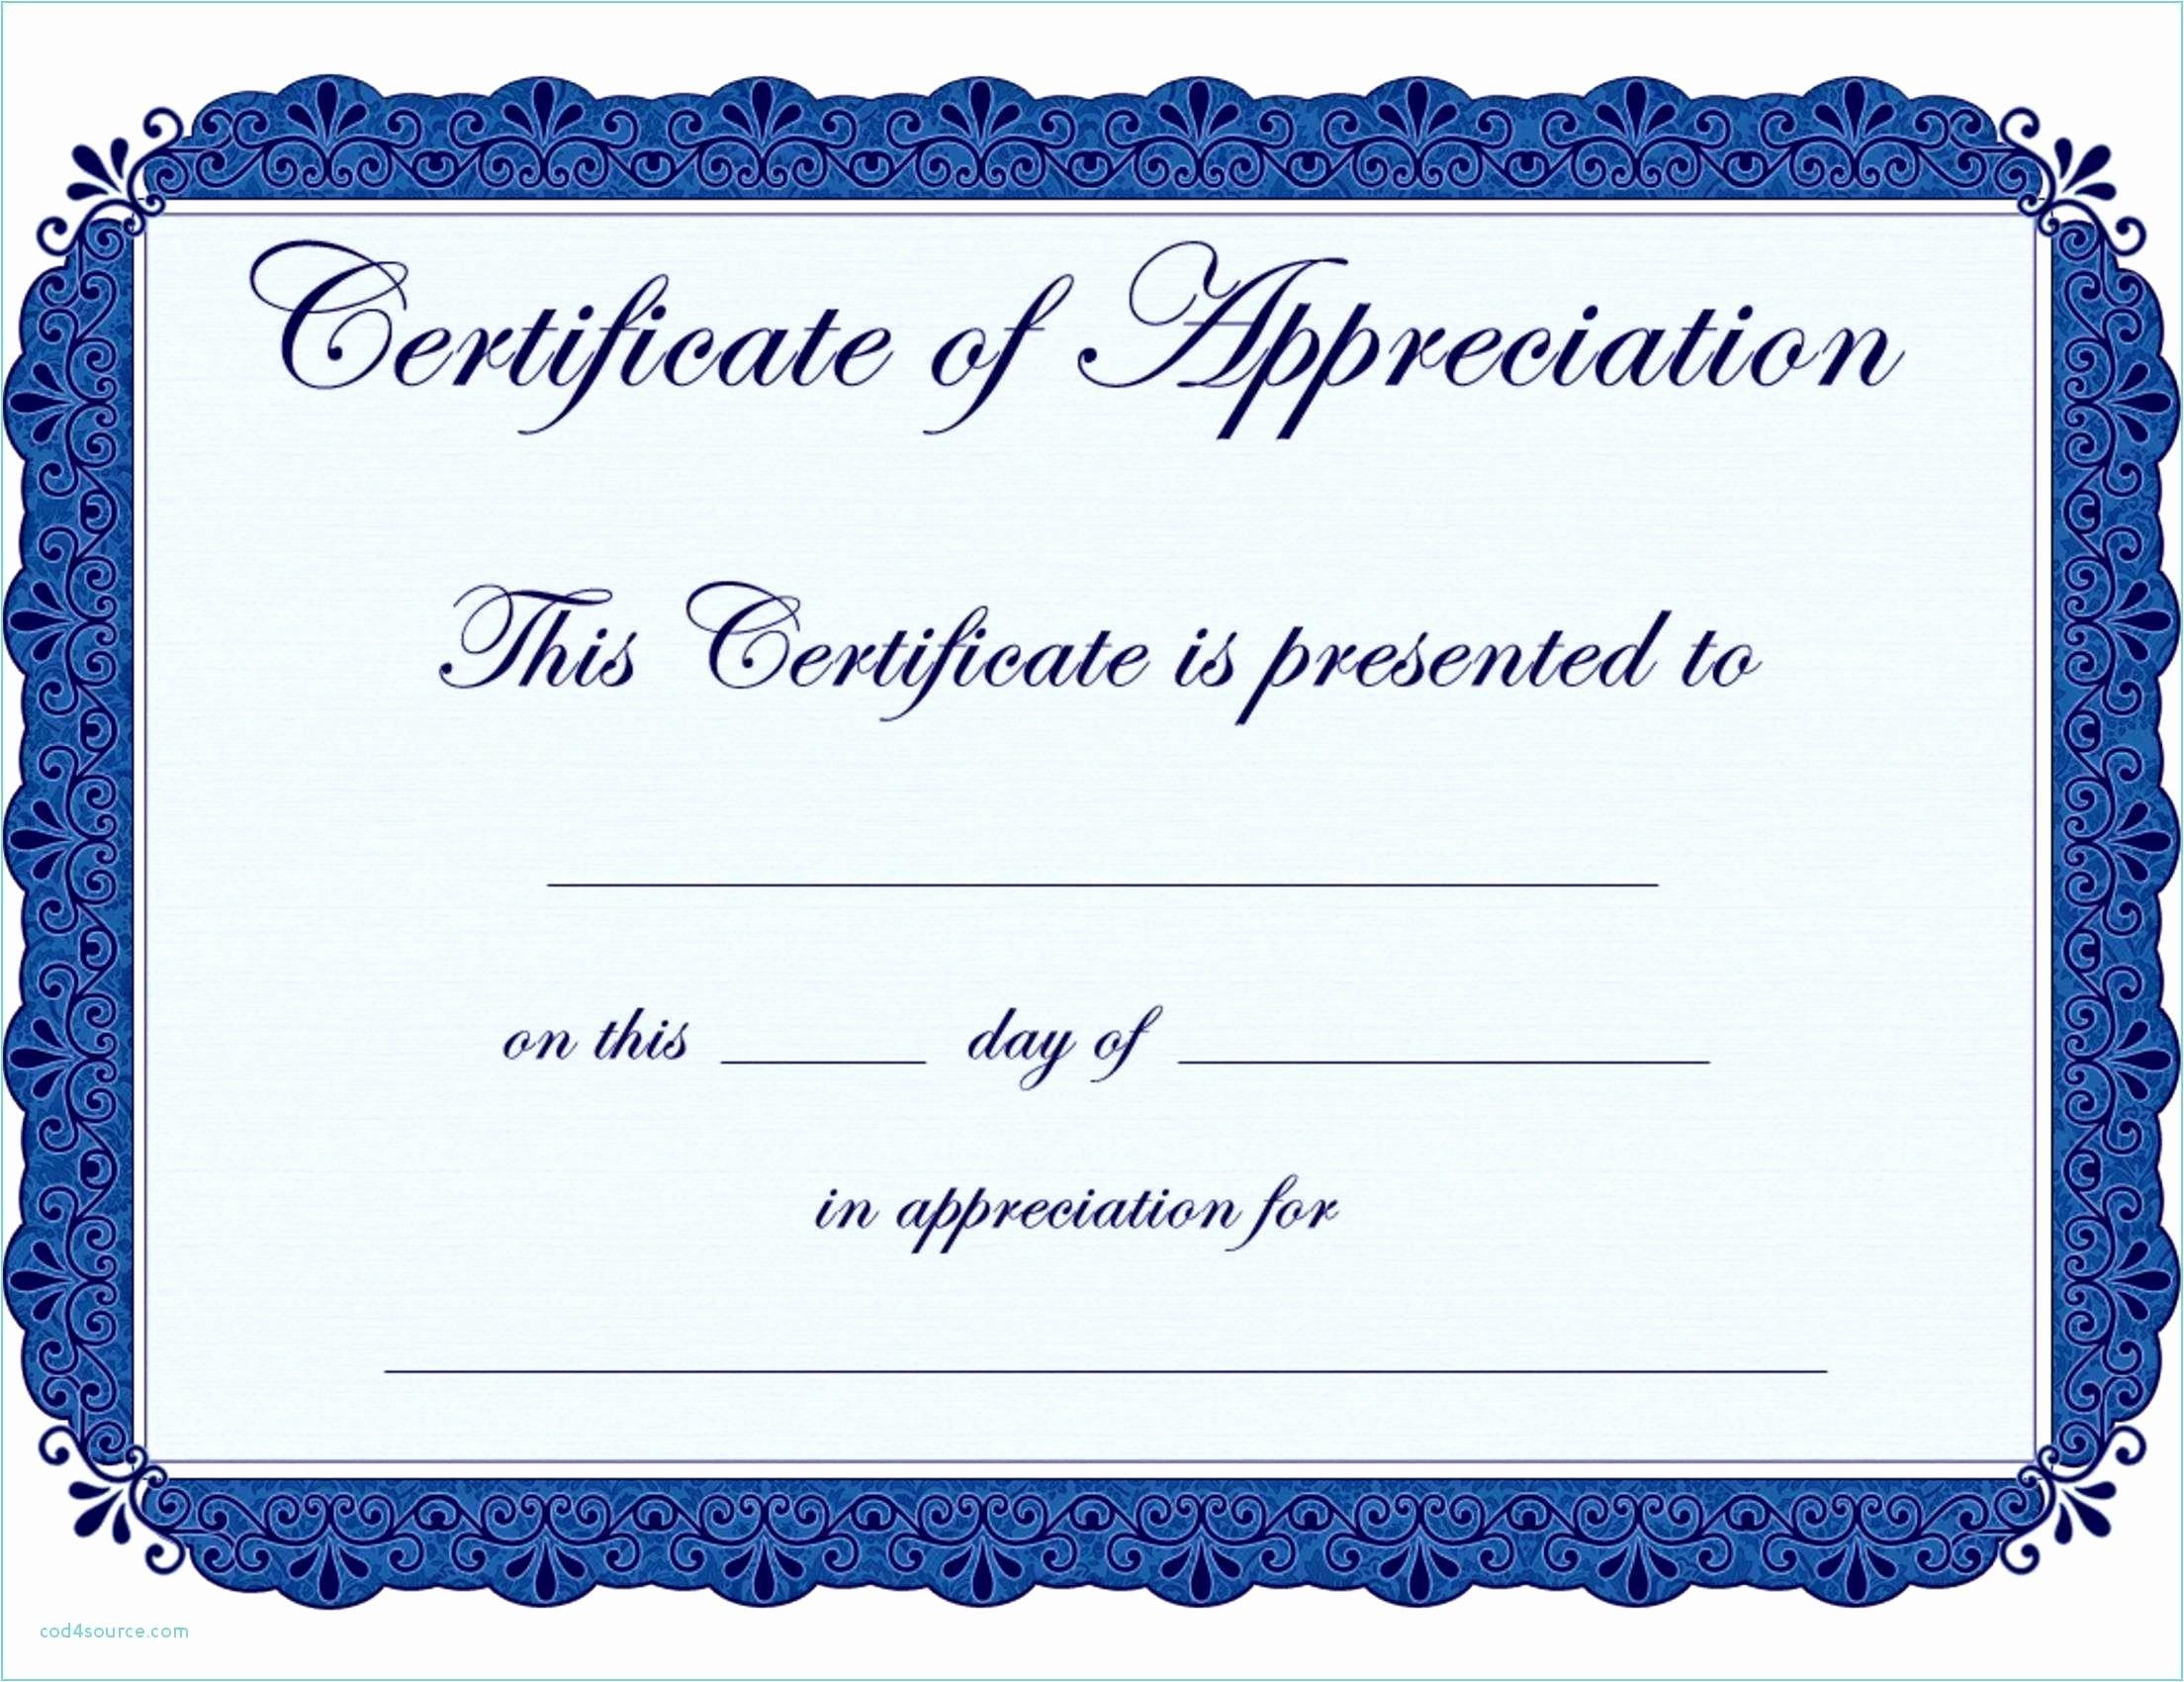 Baptism Certificate Template | Tubidportal - Free Printable Baptism Certificate